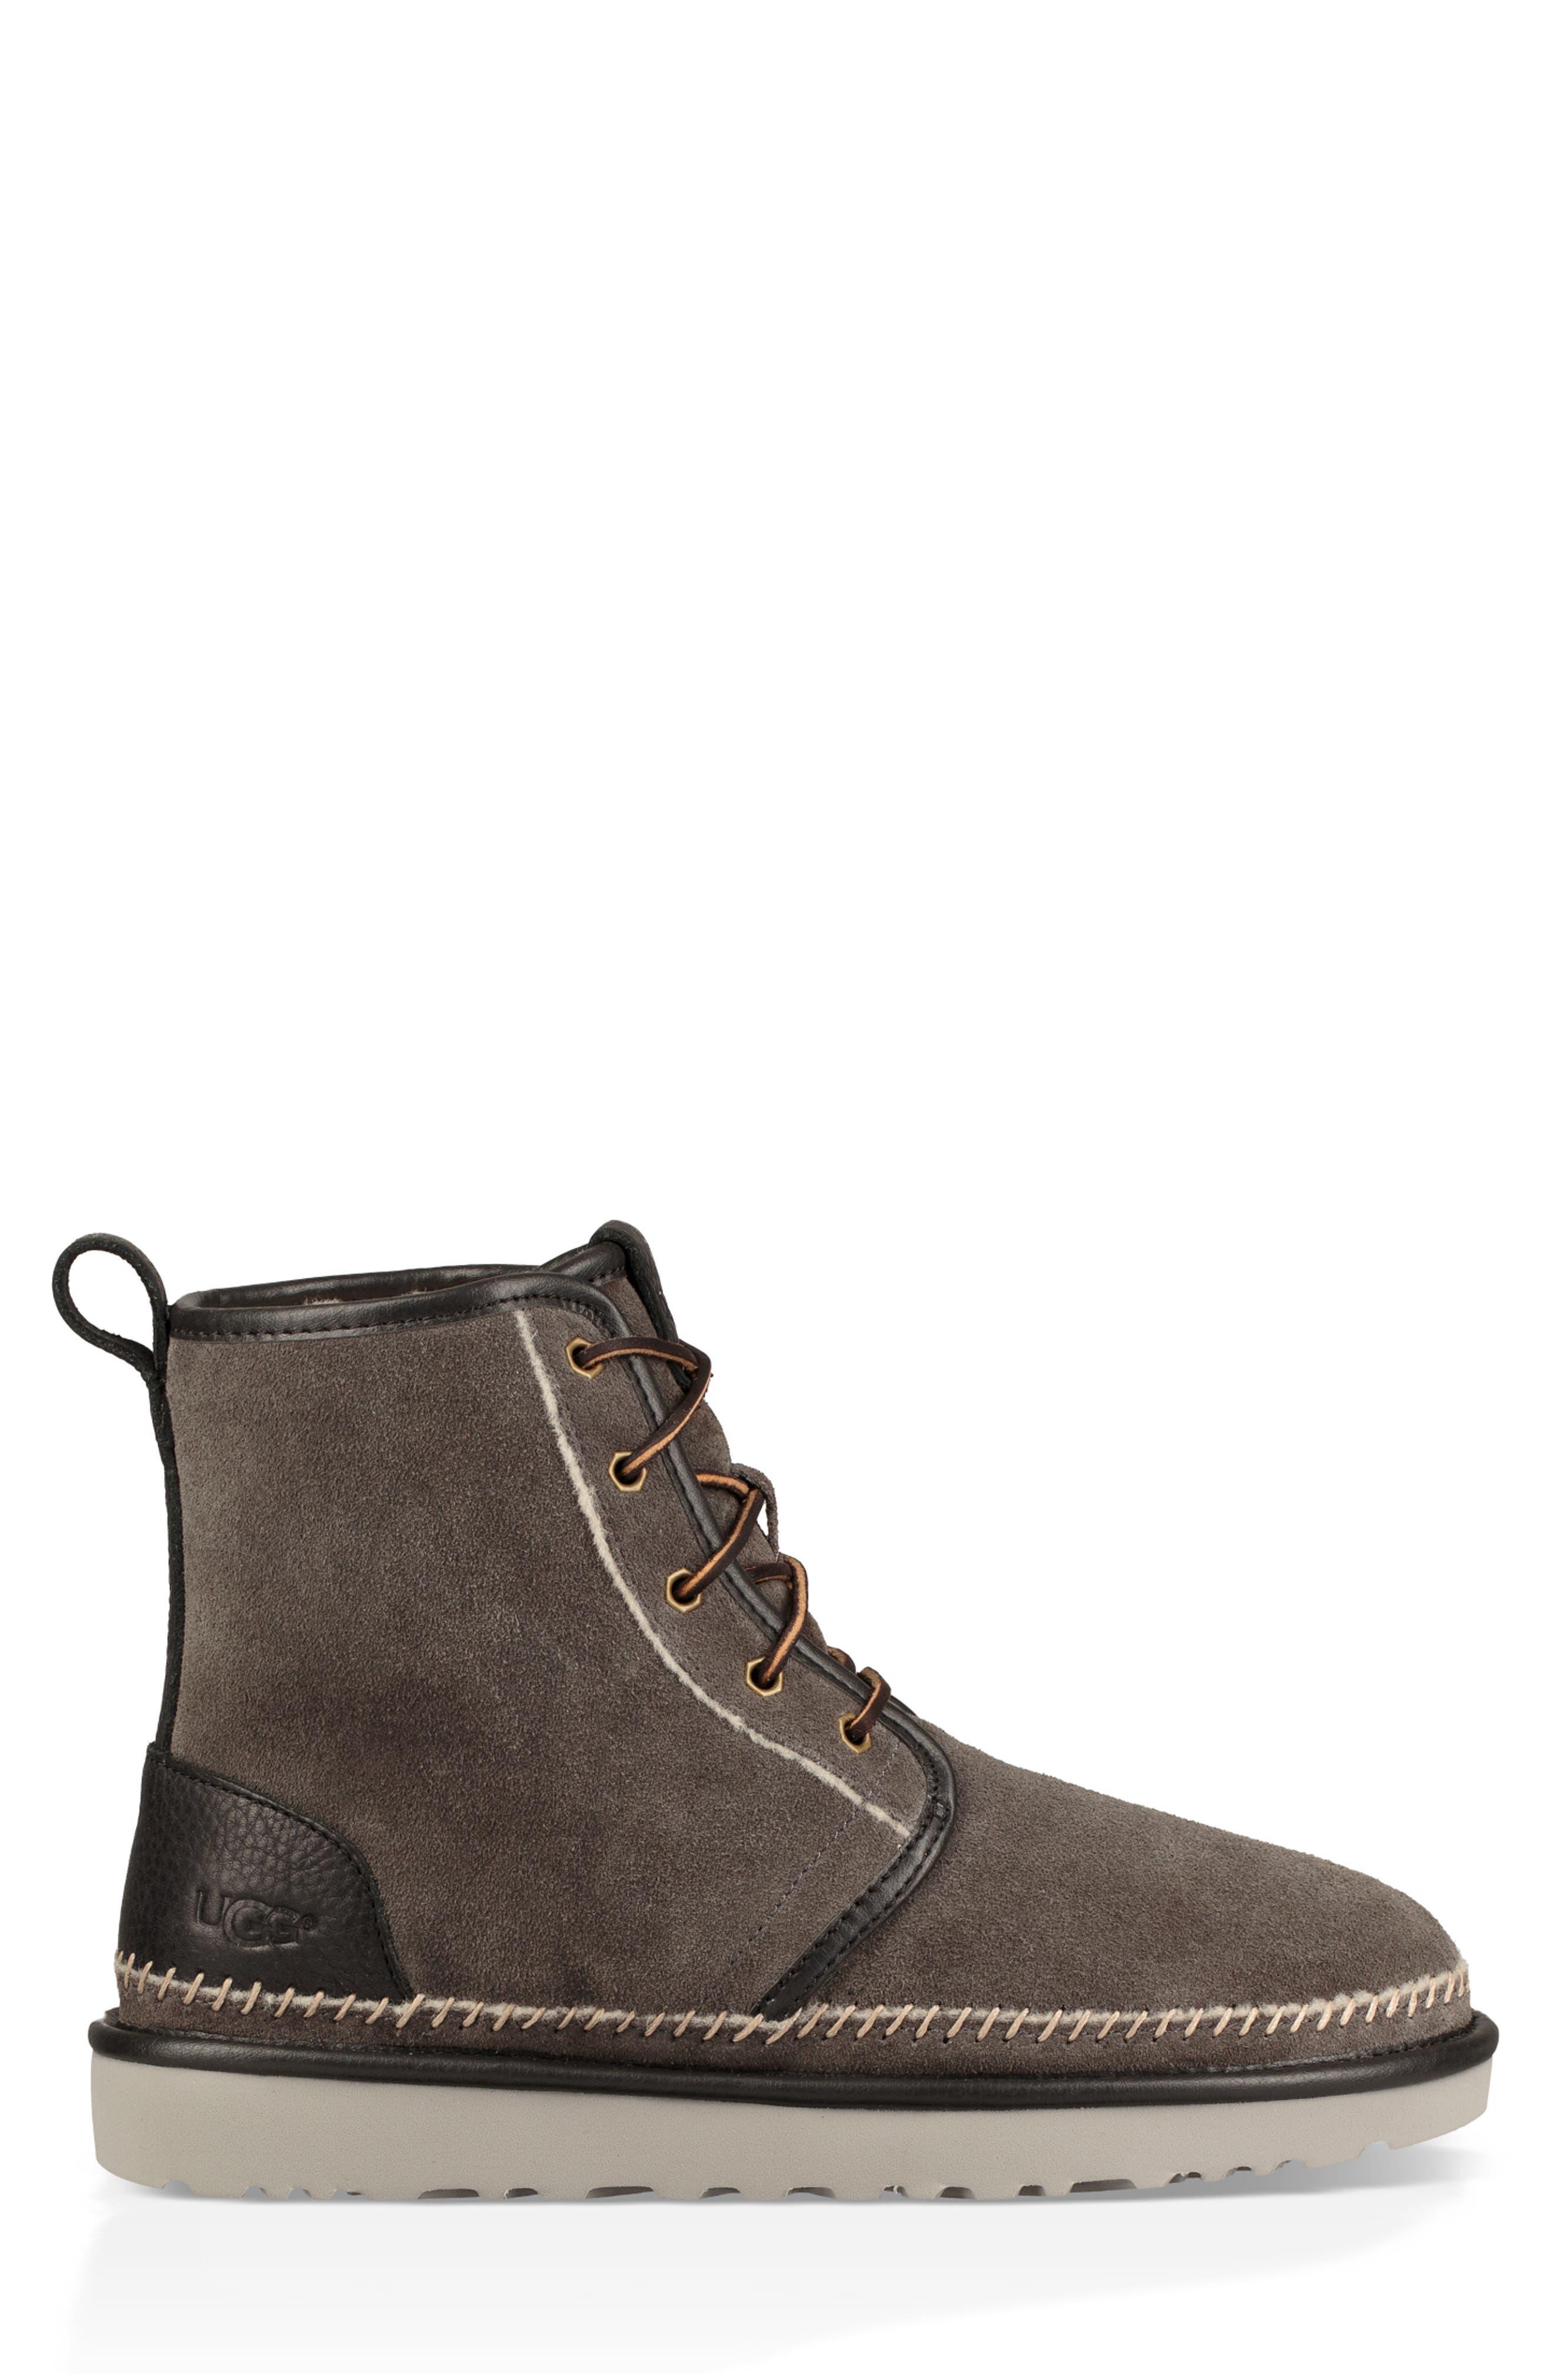 Harkley Stitch Plain Toe Boot,                             Alternate thumbnail 3, color,                             DARK GREY